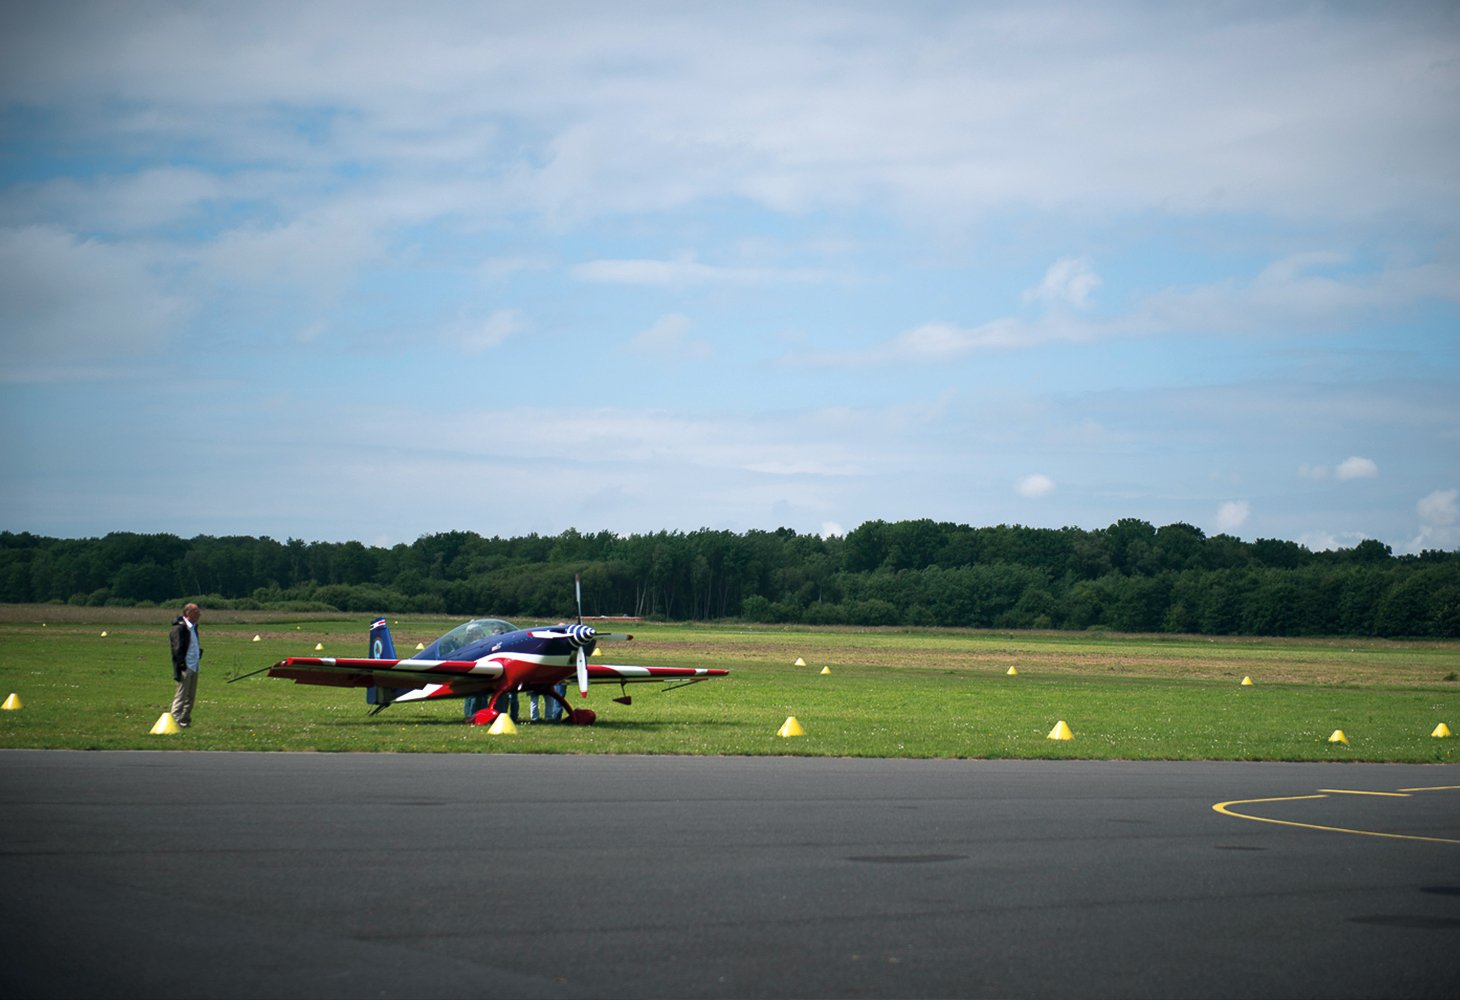 Aeroclub Saint-Gatien